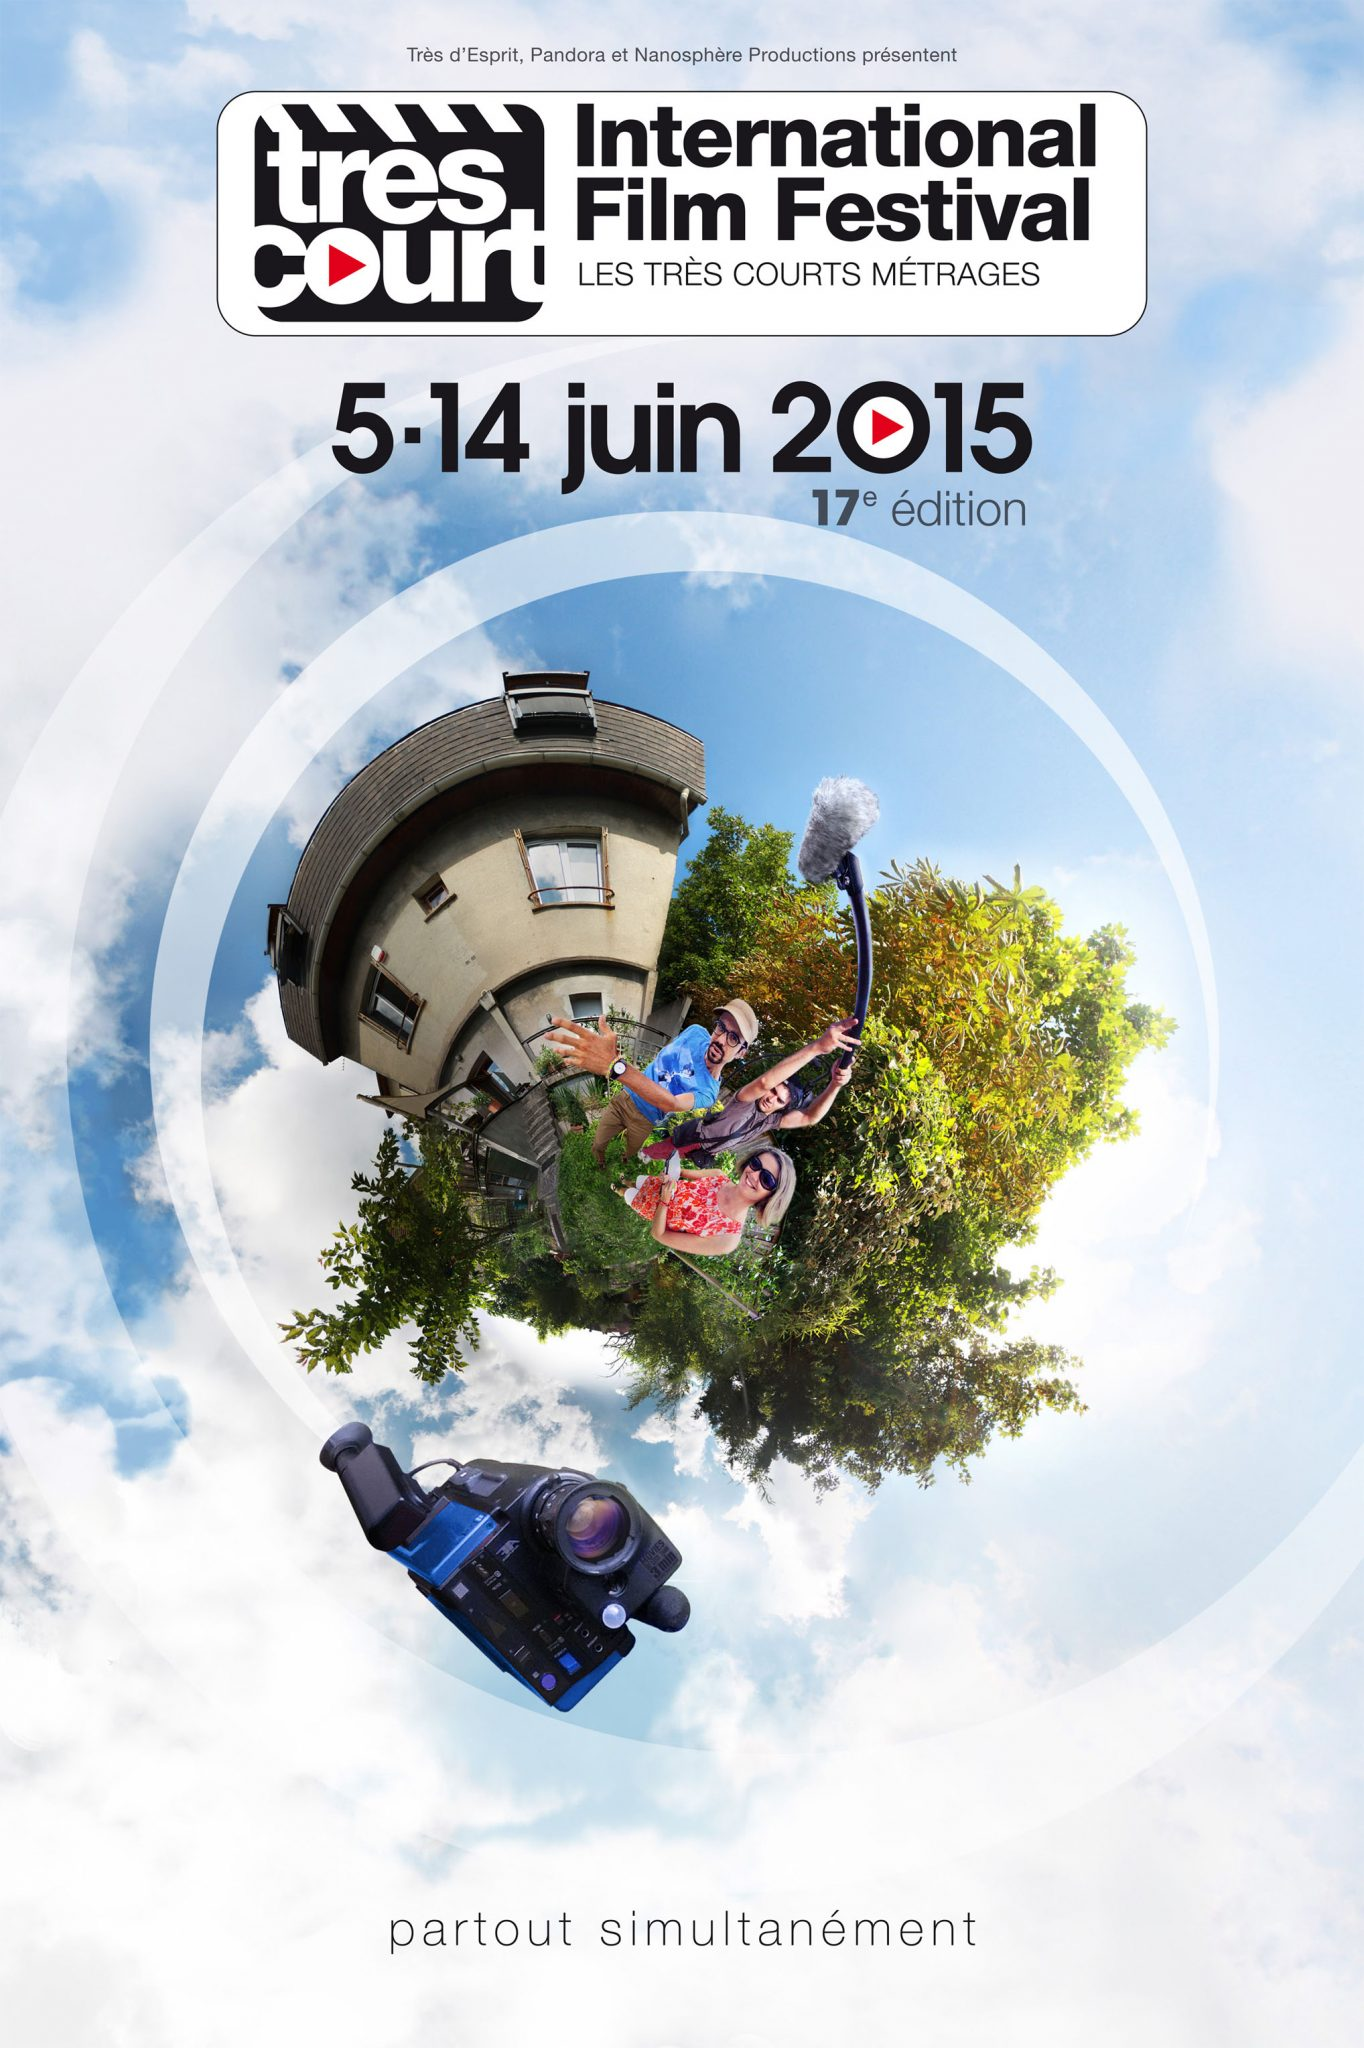 Très Court International Film Festival 2015 1 image